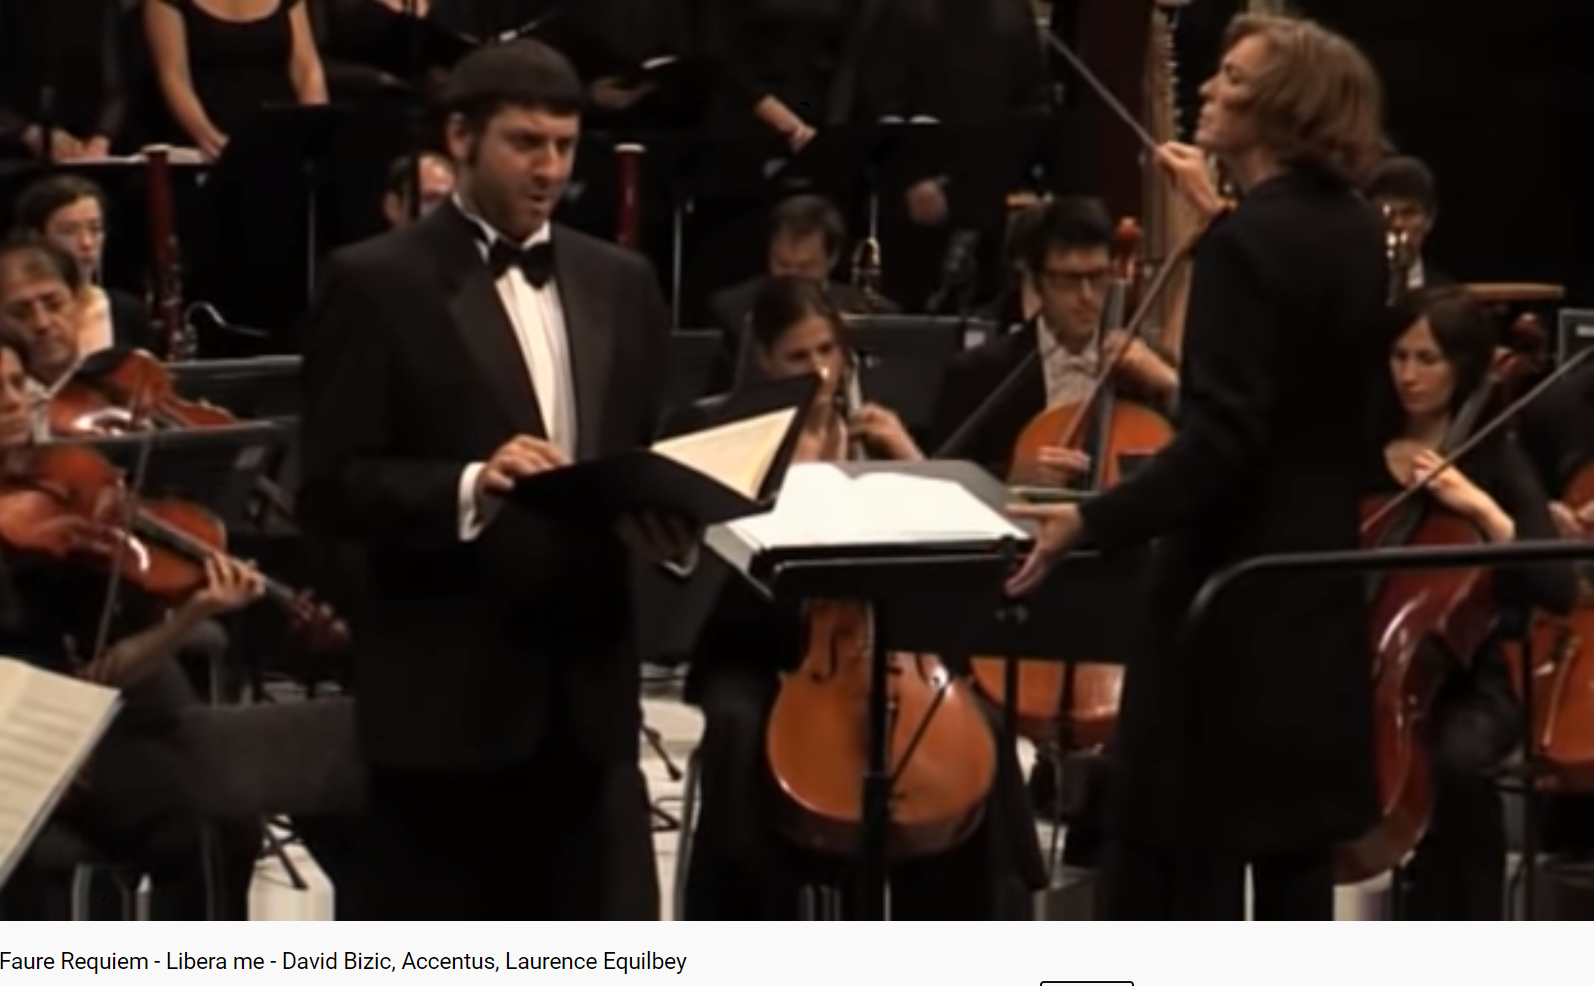 Fauré Requiem Libera me